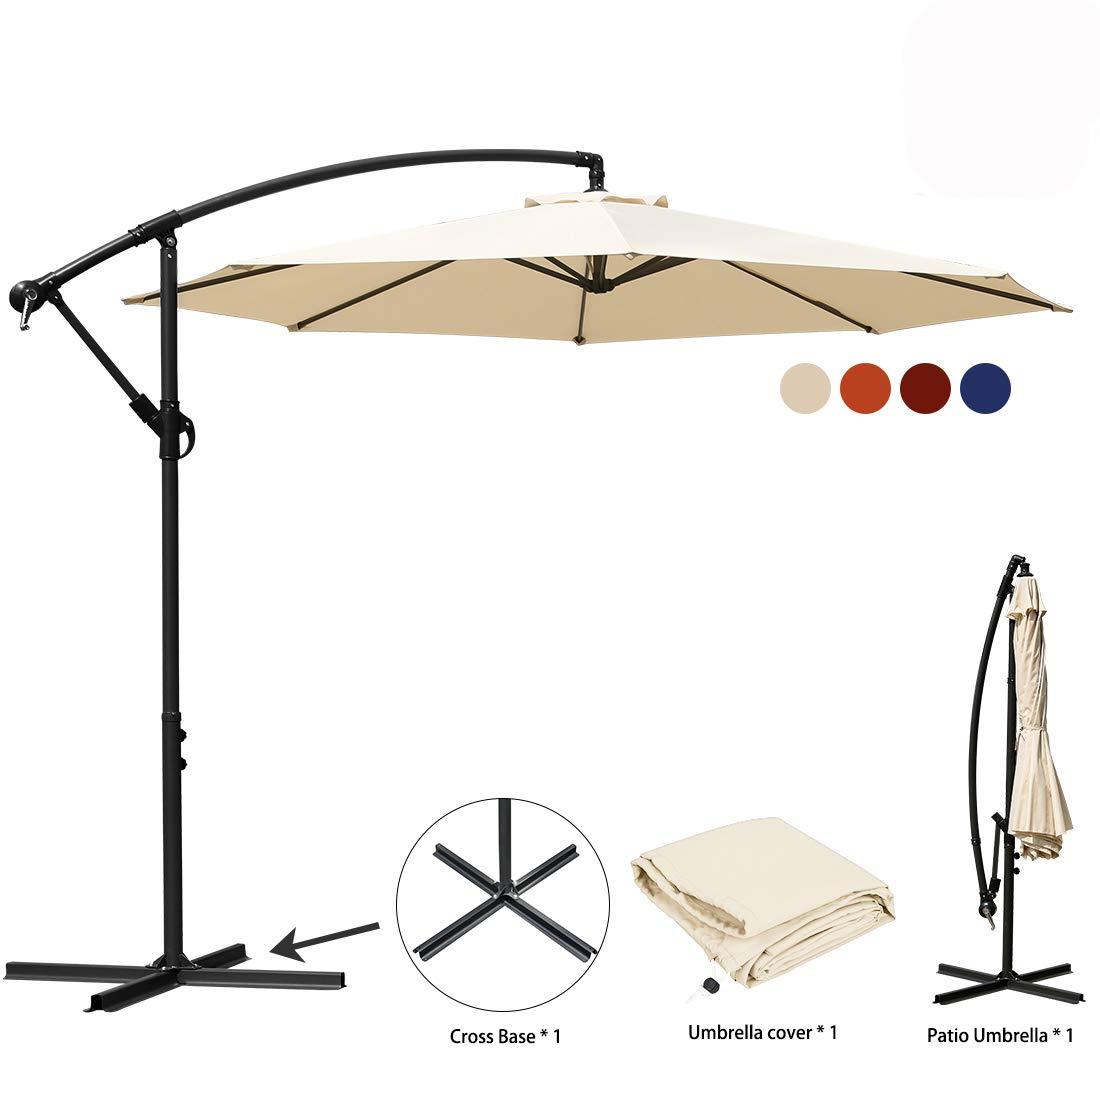 JEAREY Patio Umbrella 10 Ft Offset Cantilever Umbrellas Outdoor Market Hanging Umbrella & Crank with Cross Base, 8 Ribs (Beige1)